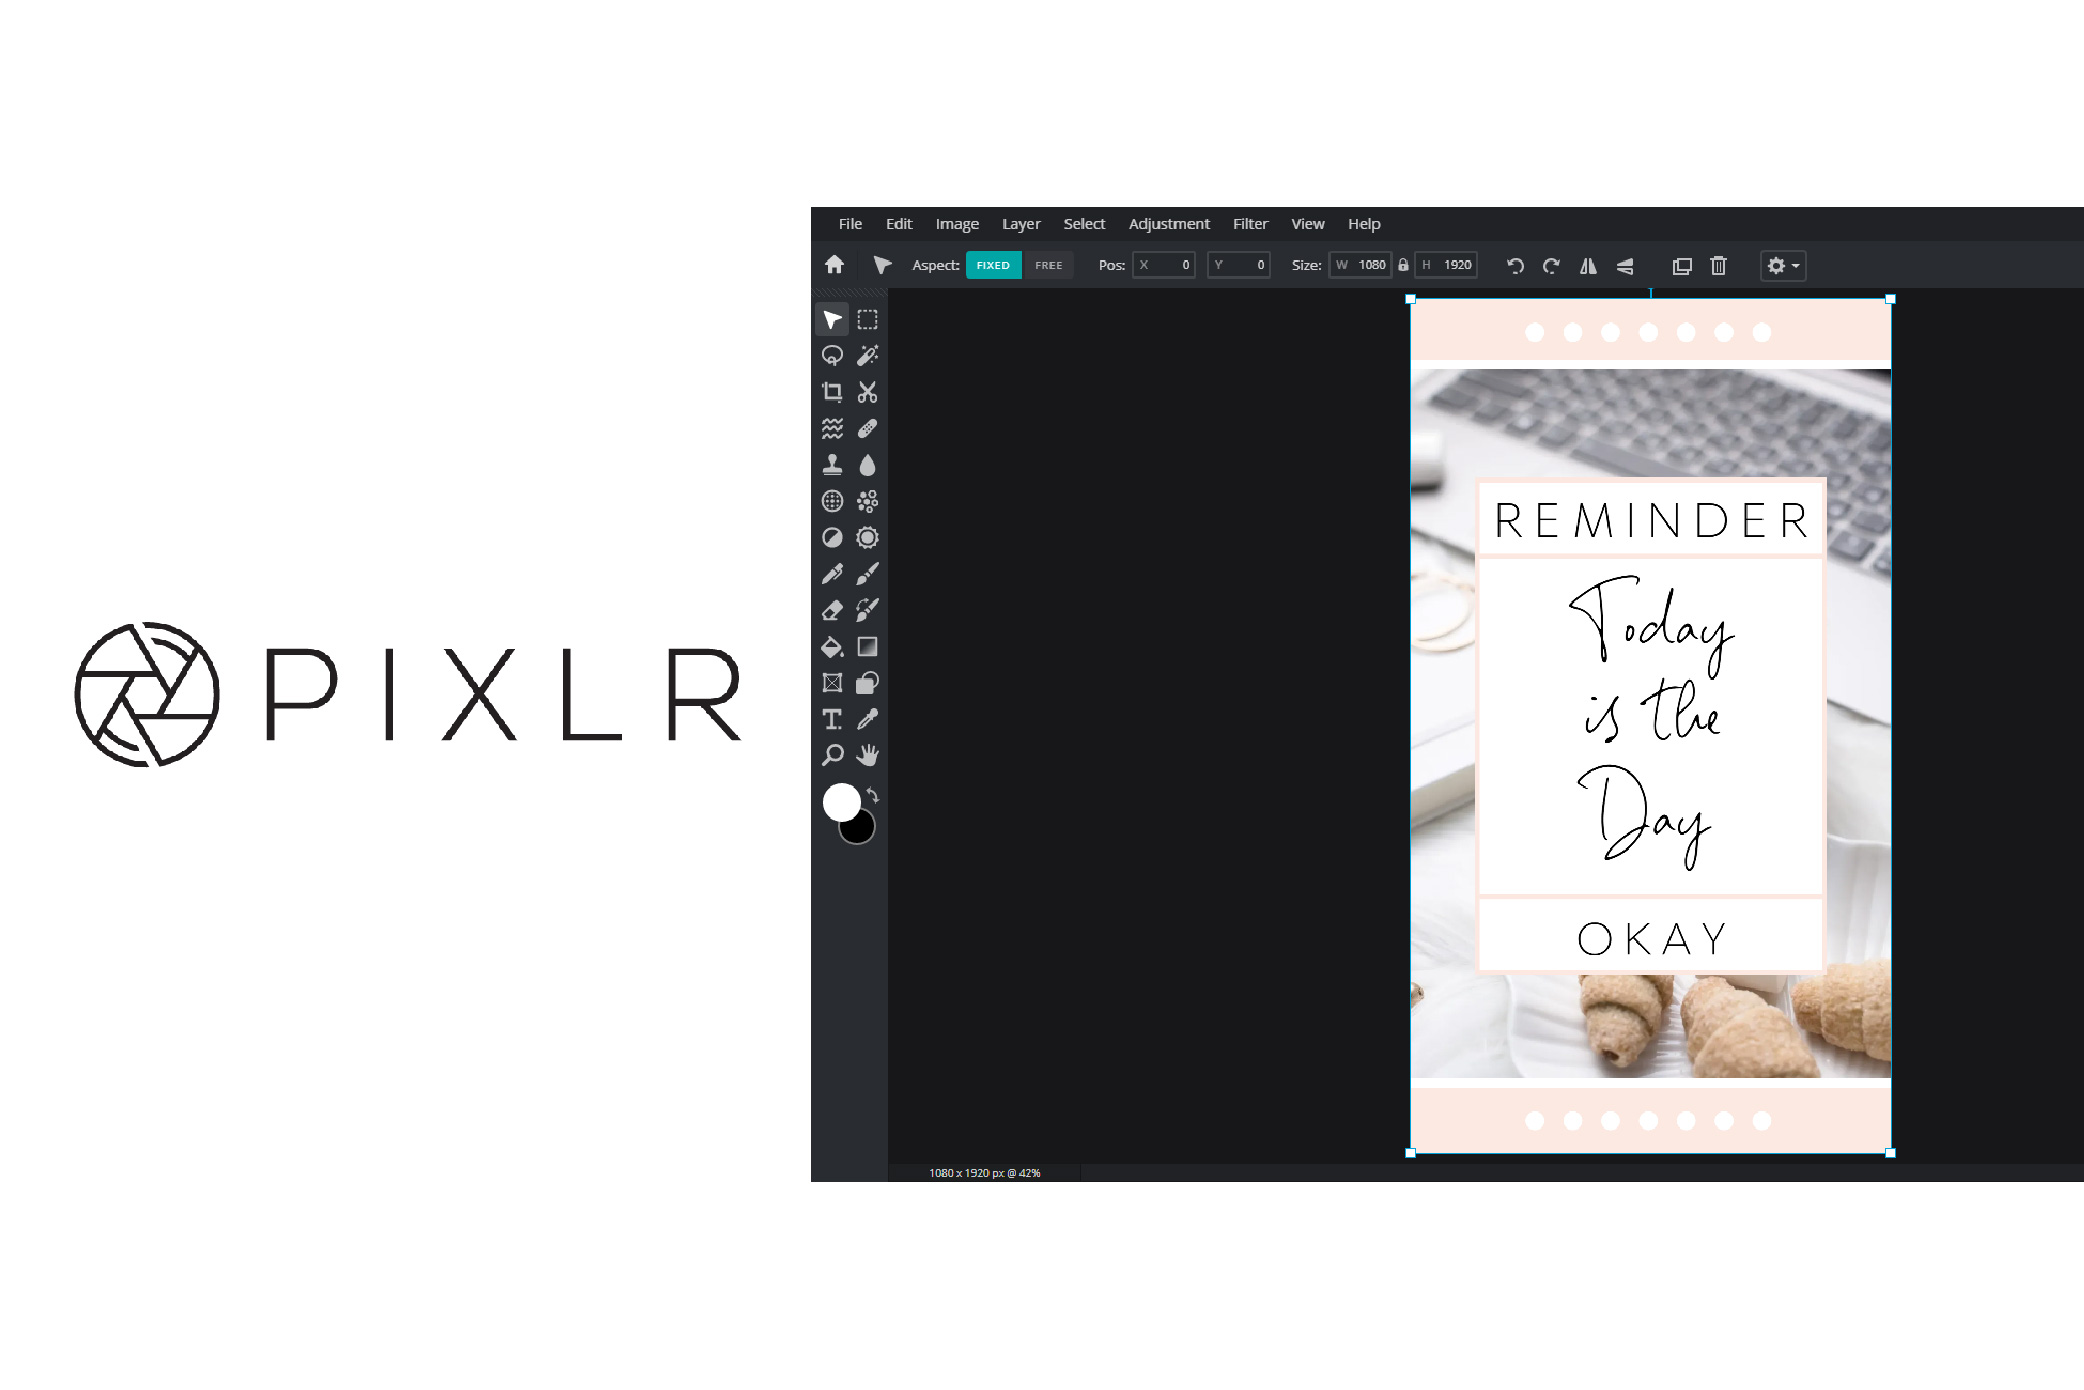 User interface of Pixlr software